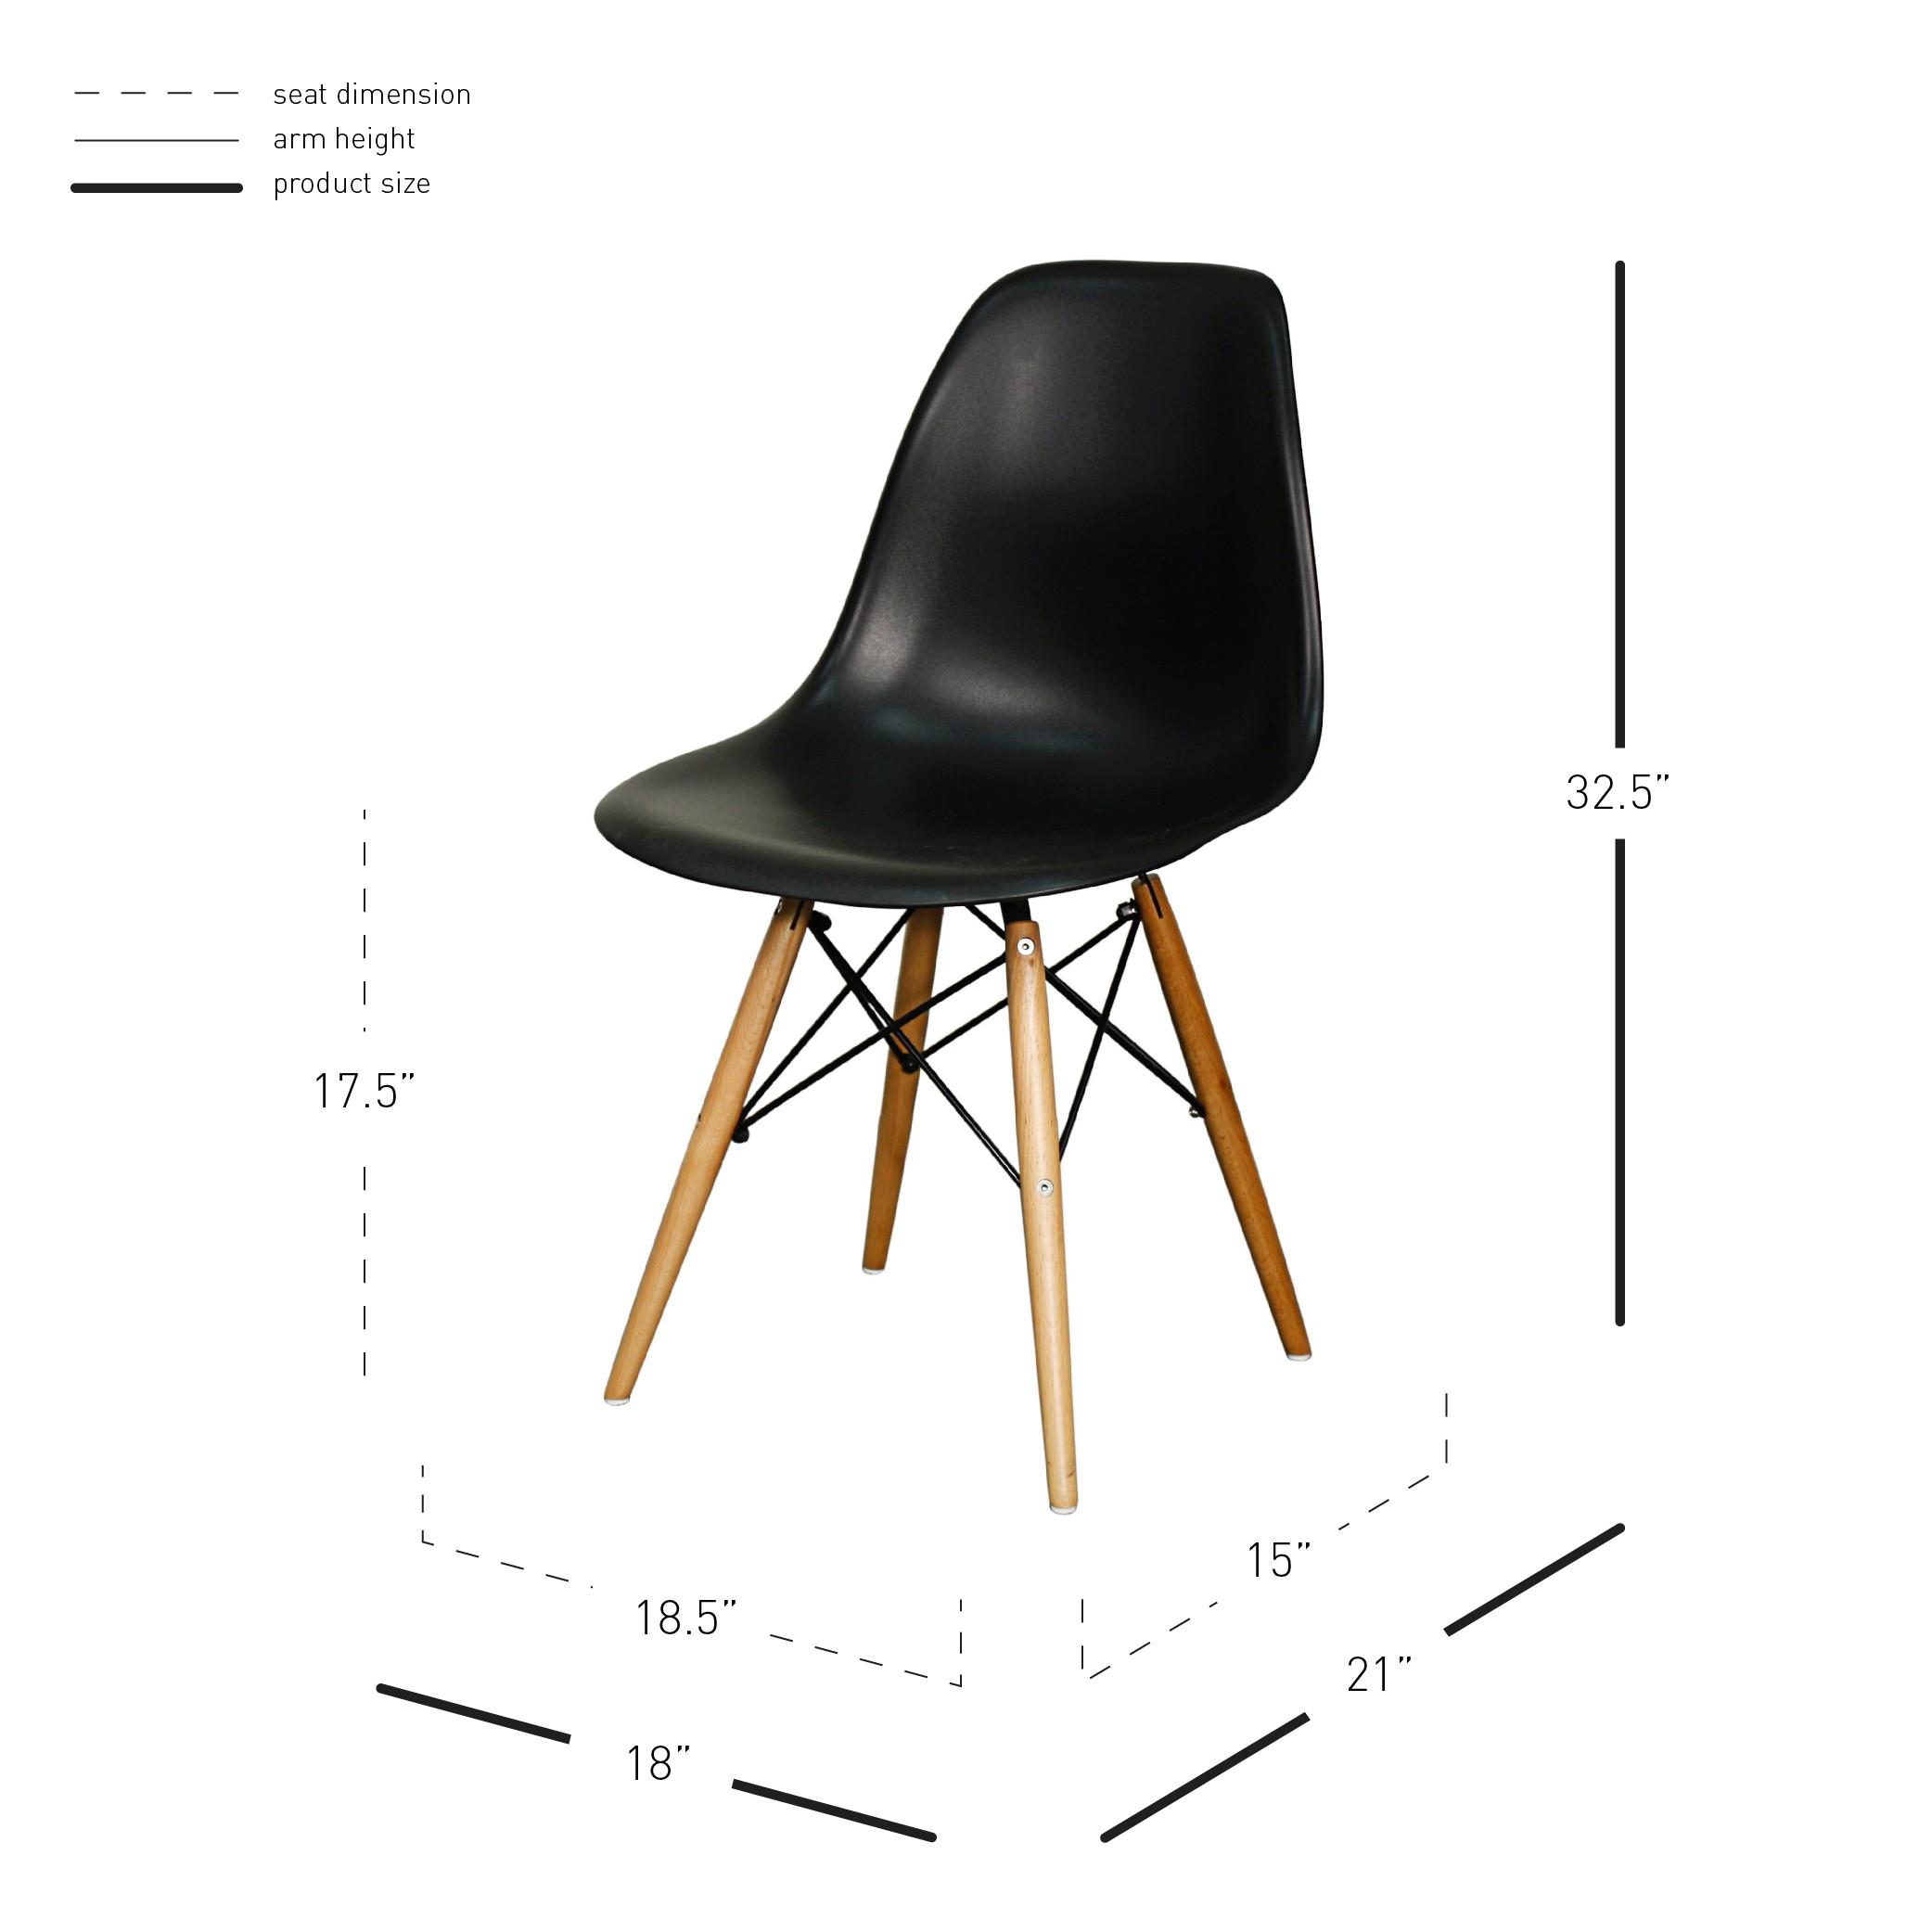 618132 B M Npd Home Furniture Wholesale Lifestyle